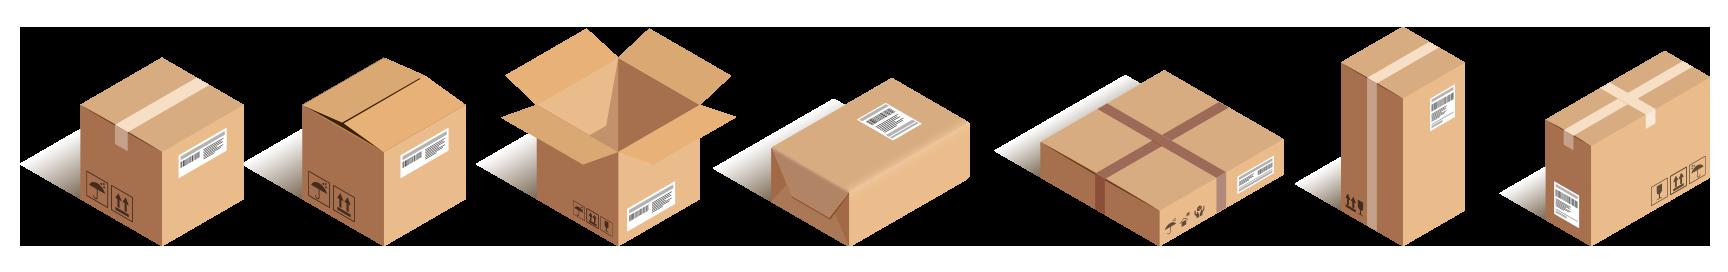 blank box assortment